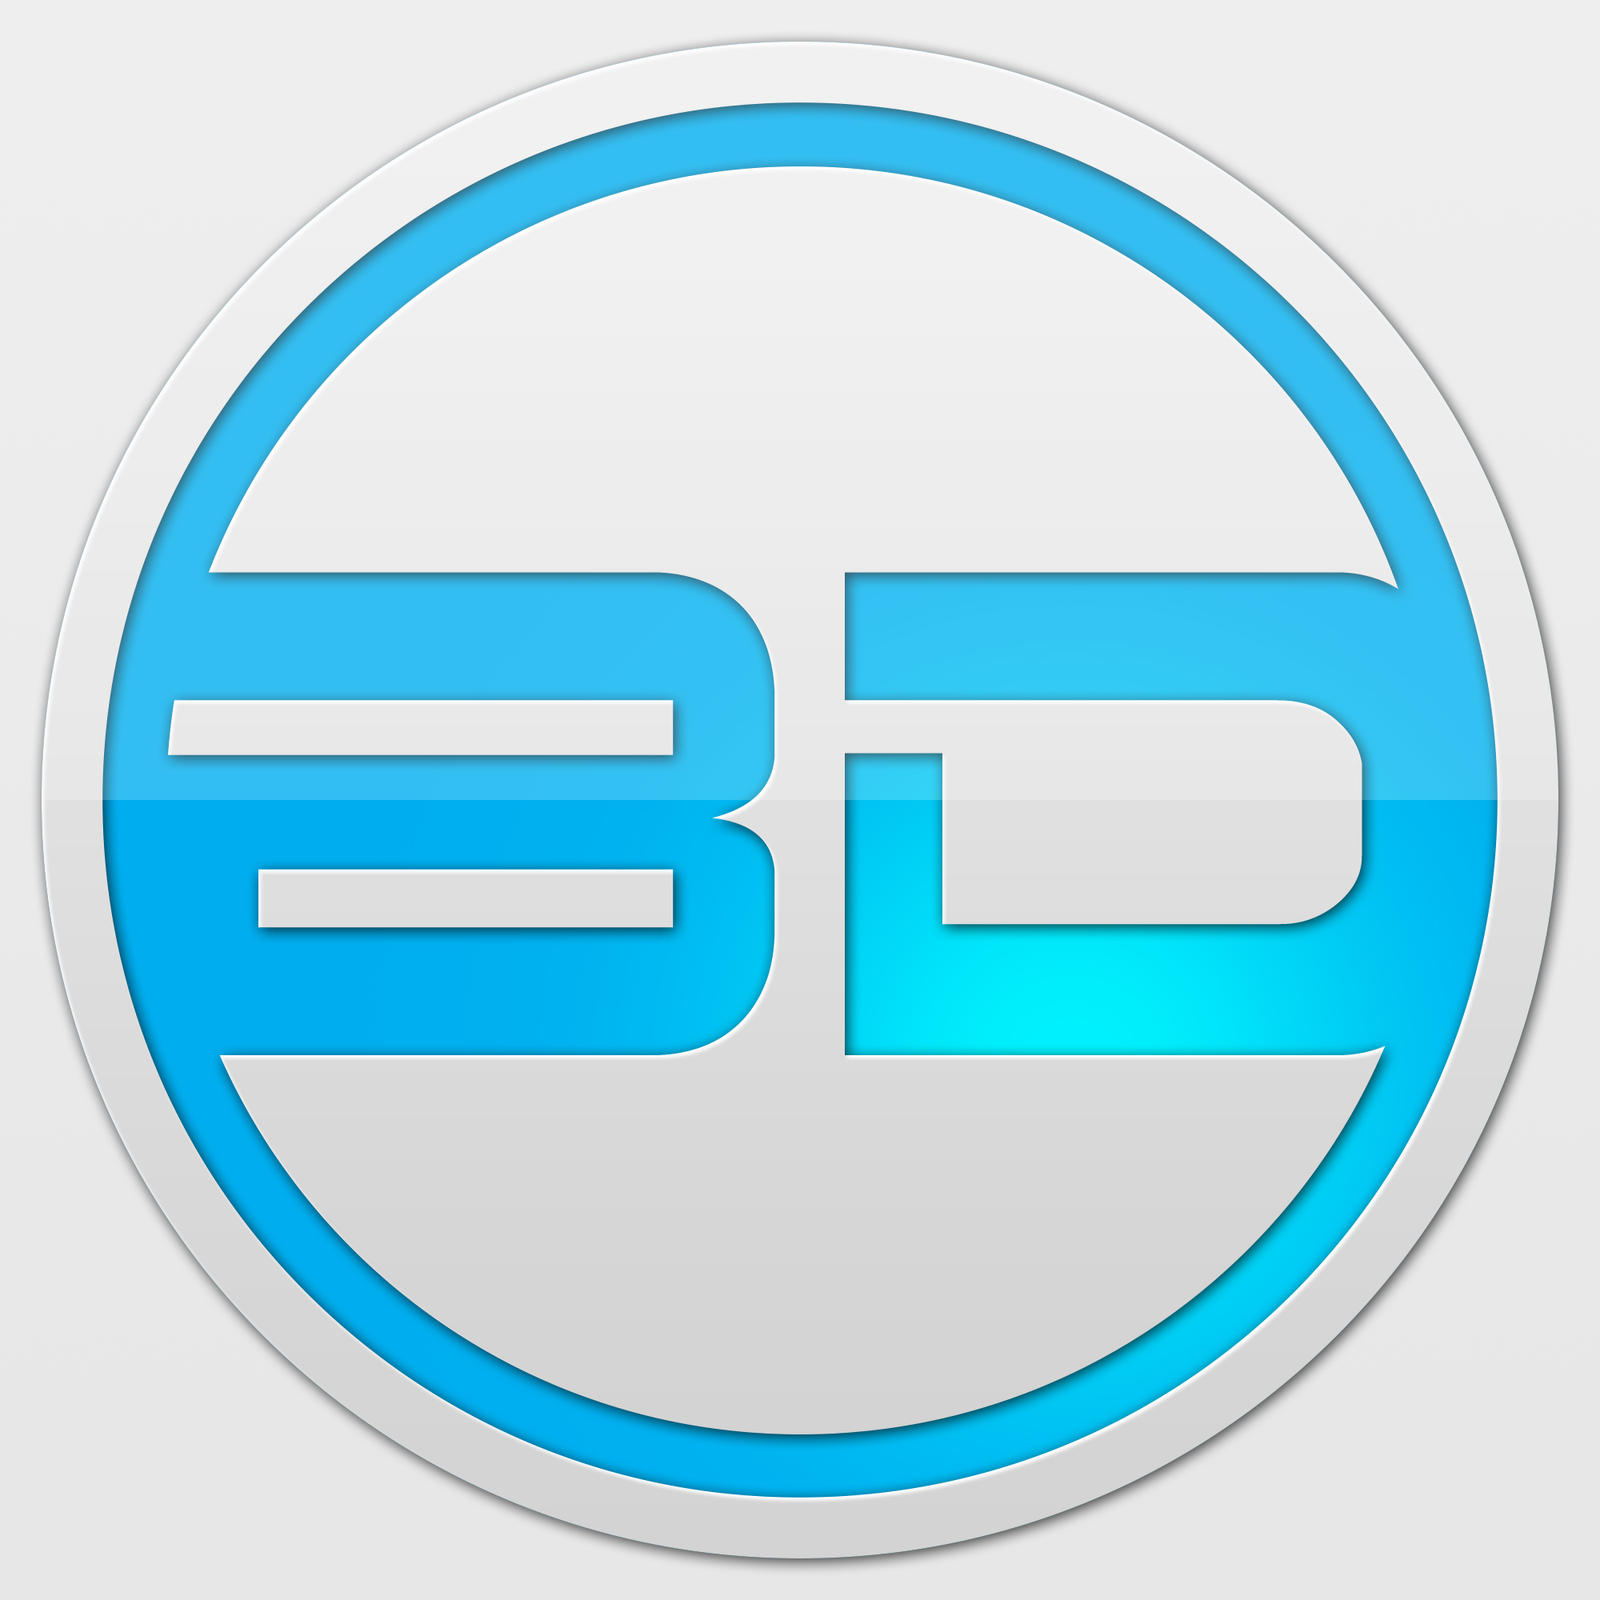 BD Blue Logo by BlackDiamondOne on DeviantArt